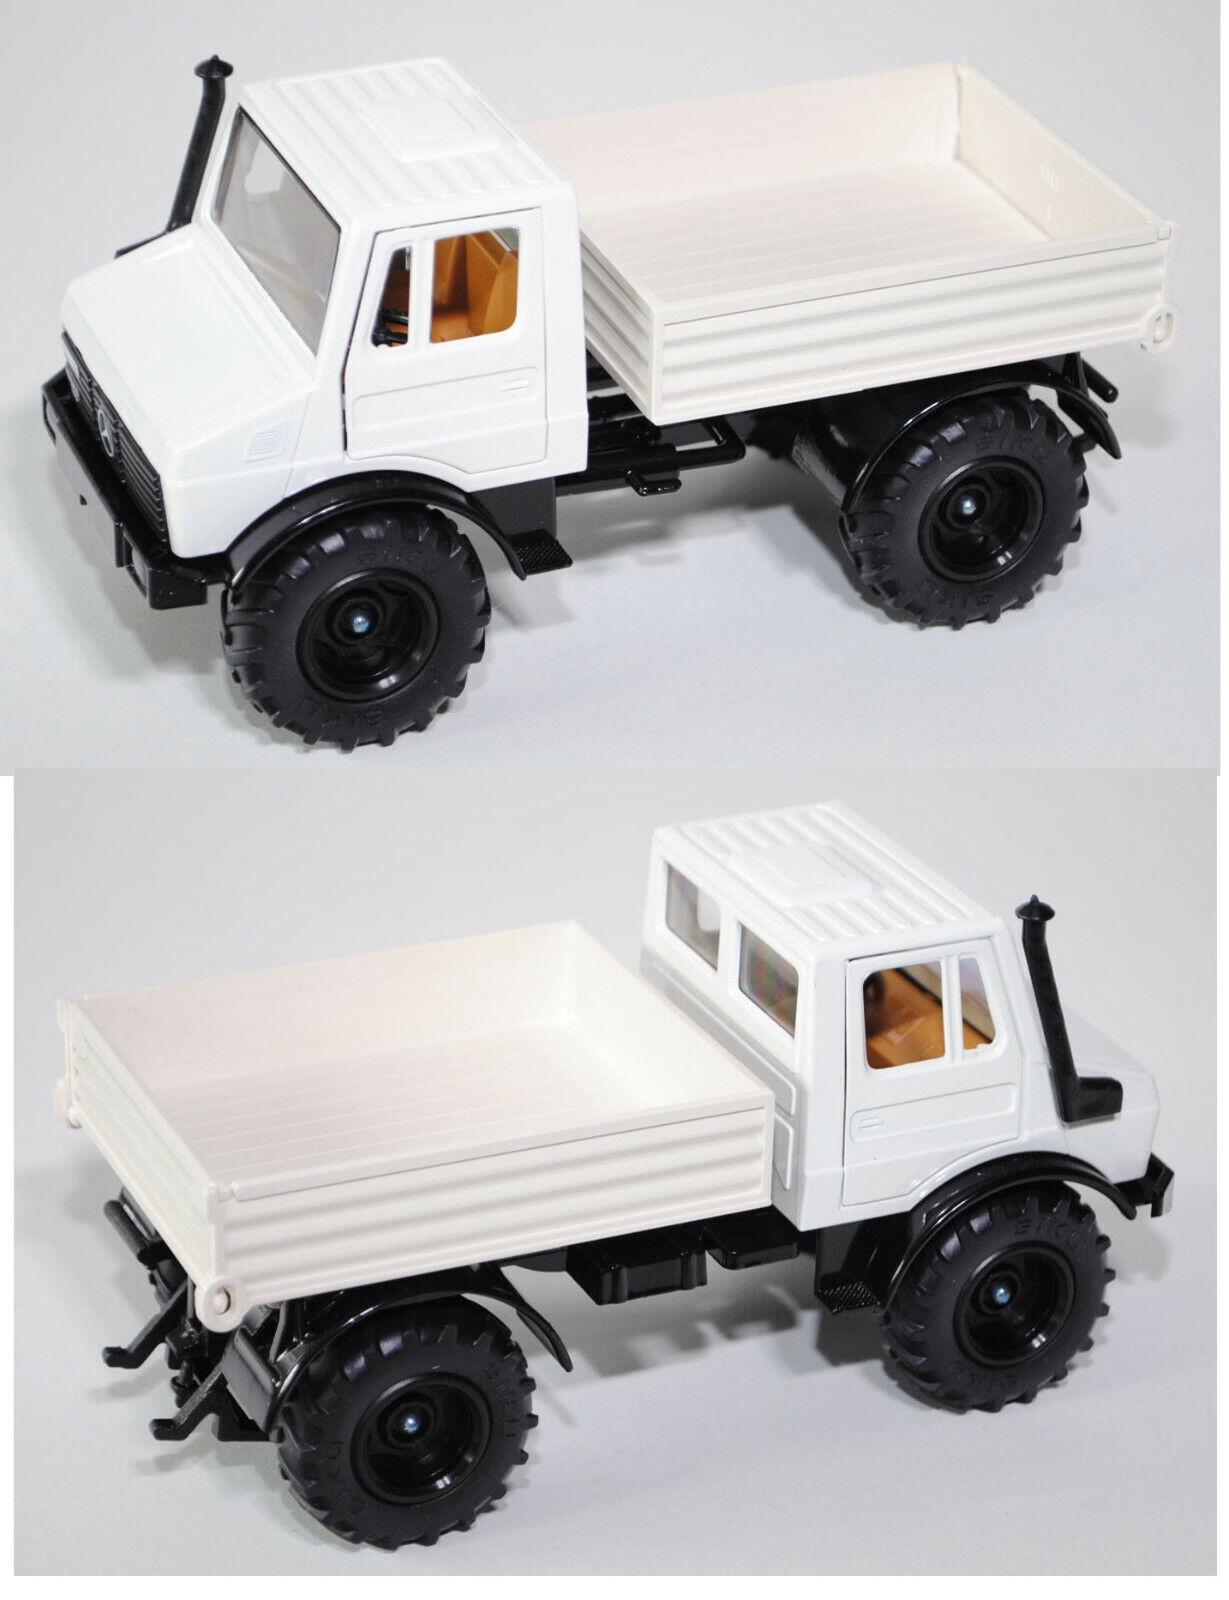 Siku Farmer 3153 Mercedes-Benz Unimog U 1500, white, 1 1 1 32, Sondermodell 49bd5a